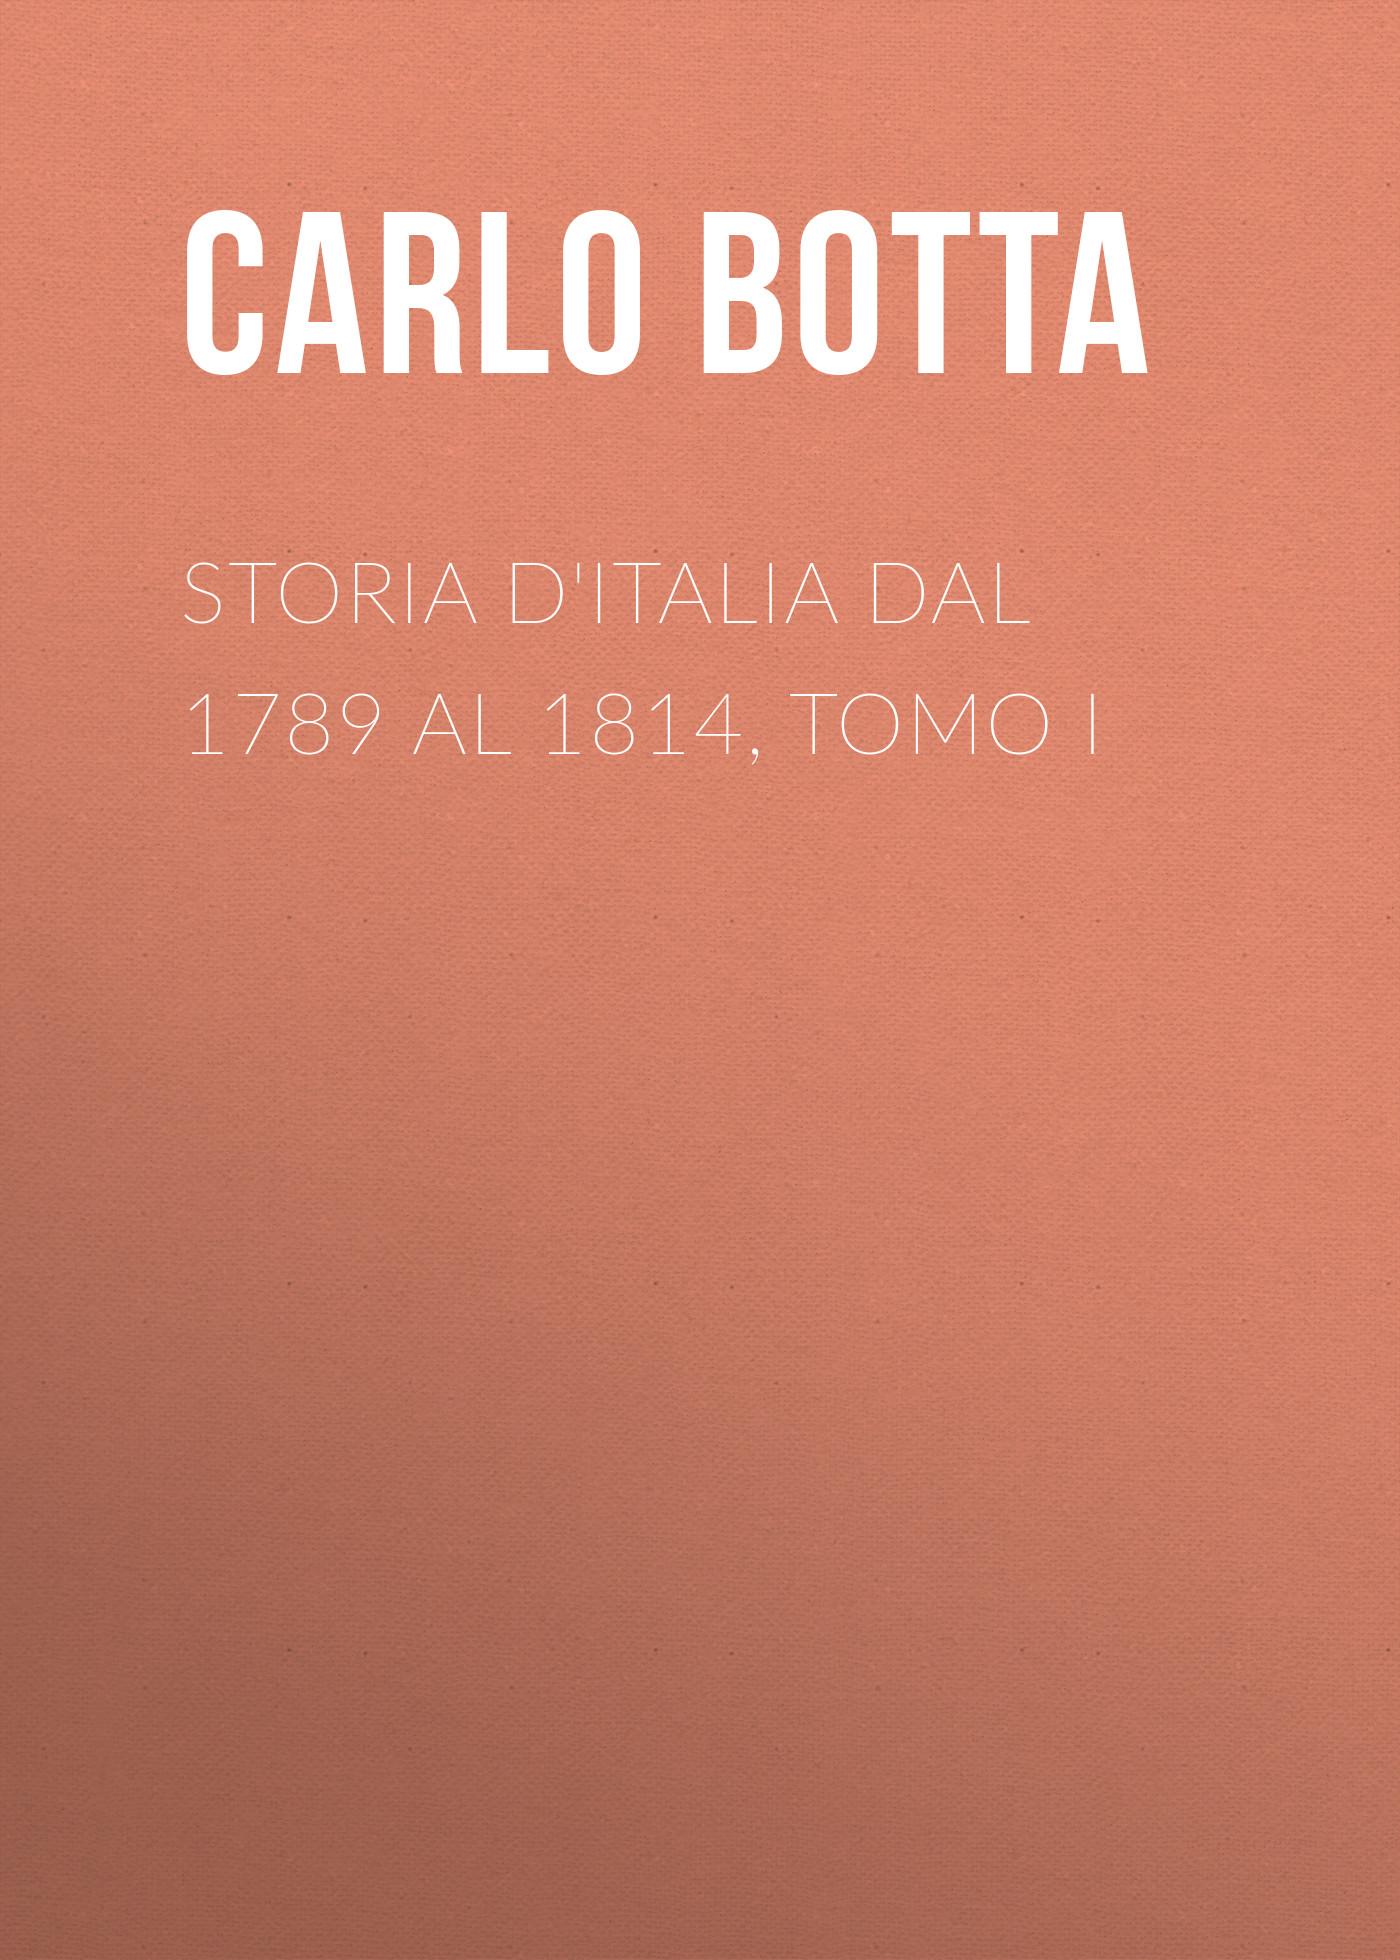 Botta Carlo Storia d'Italia dal 1789 al 1814, tomo I charles botta histoire d italie de 1789 a 1814 t 3